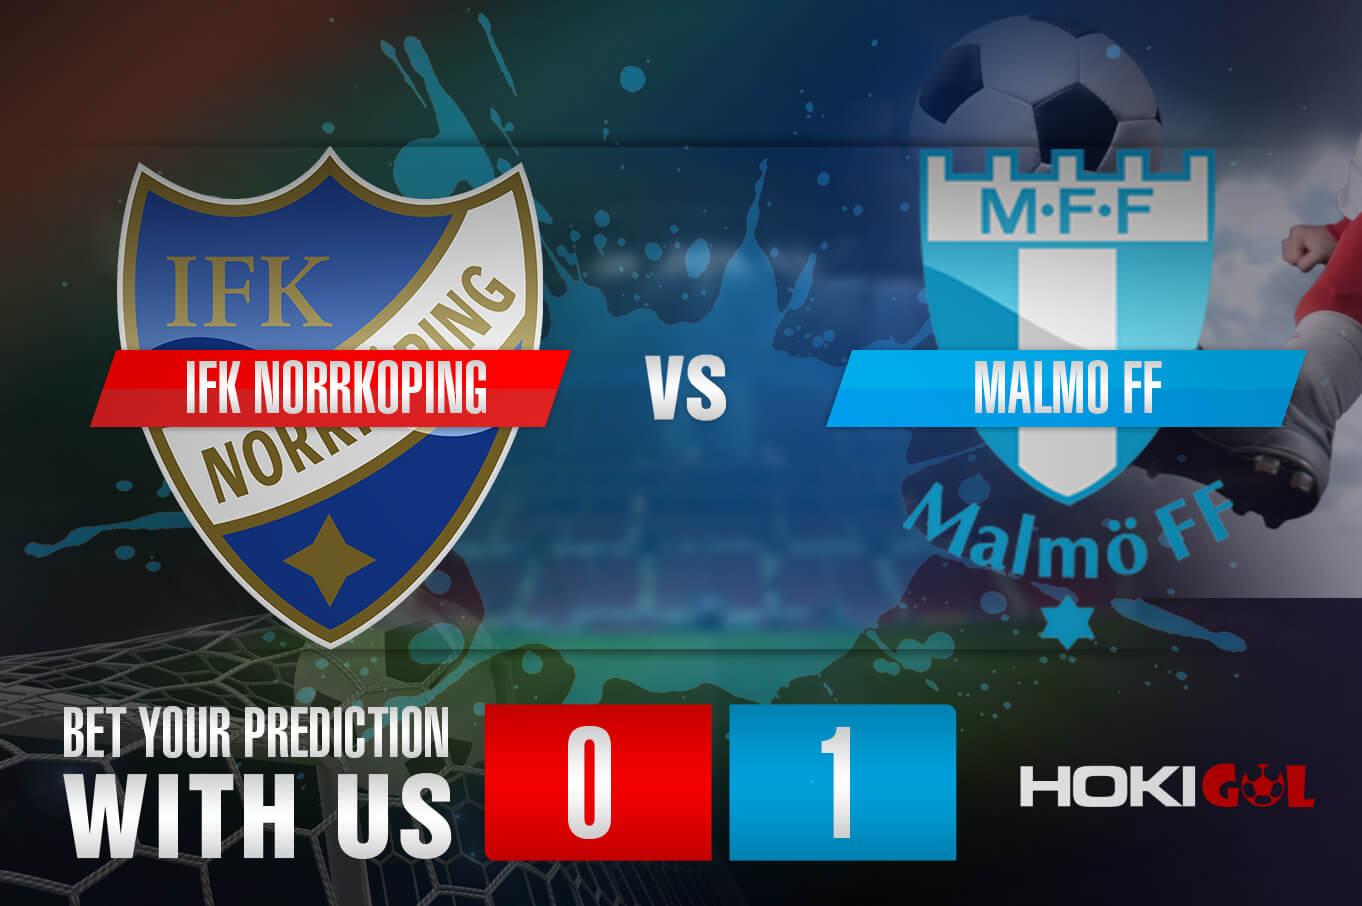 Prediksi Bola IFK Norrkoping Vs Malmo FF 3 Juli 2021